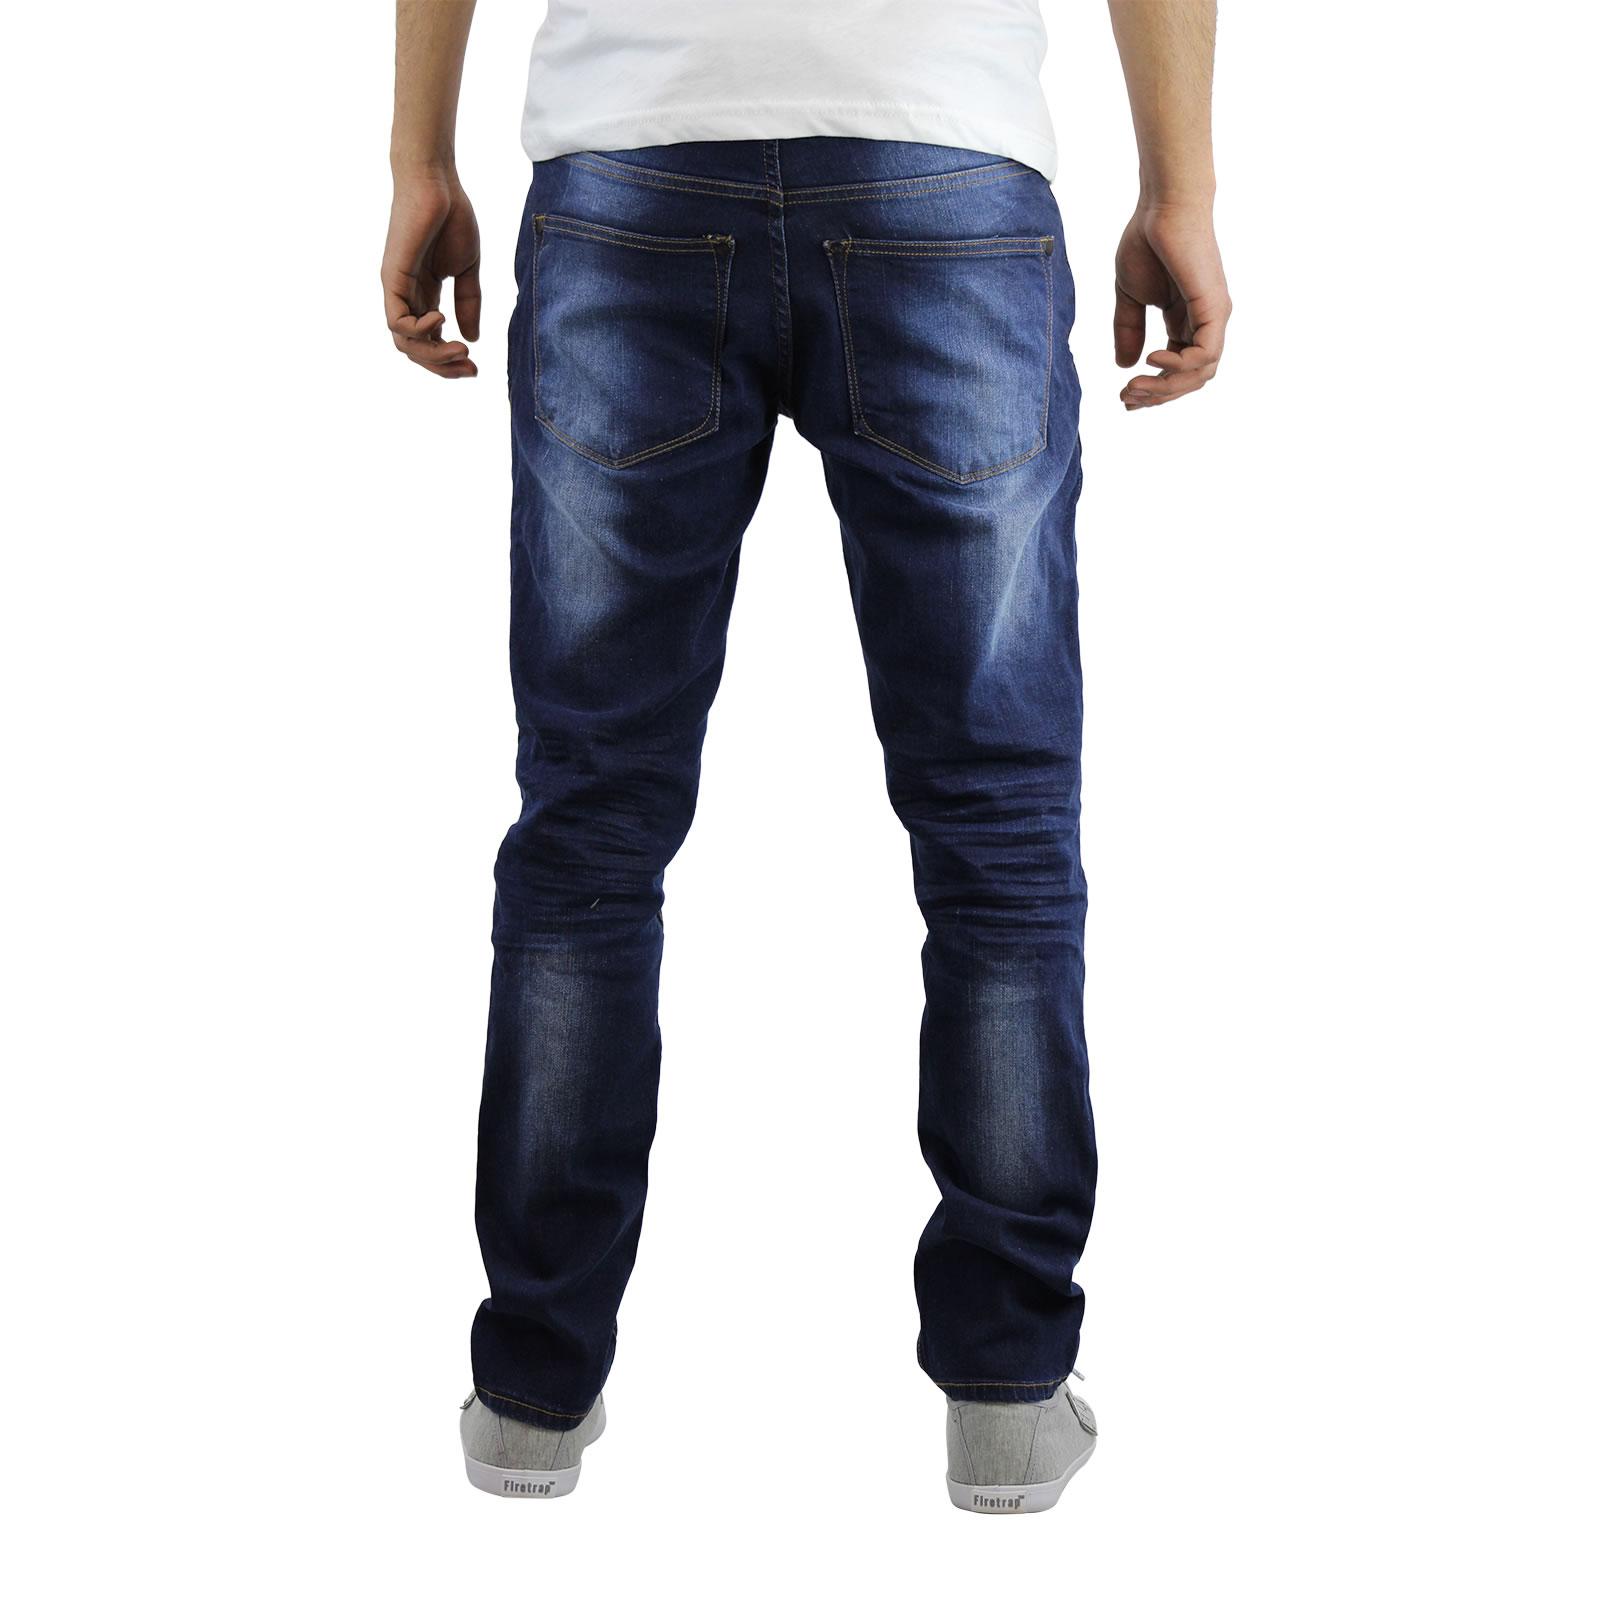 miniature 7 - Homme Crosshatch Jaco Slim Jeans stretch pantalon denim effet vieilli